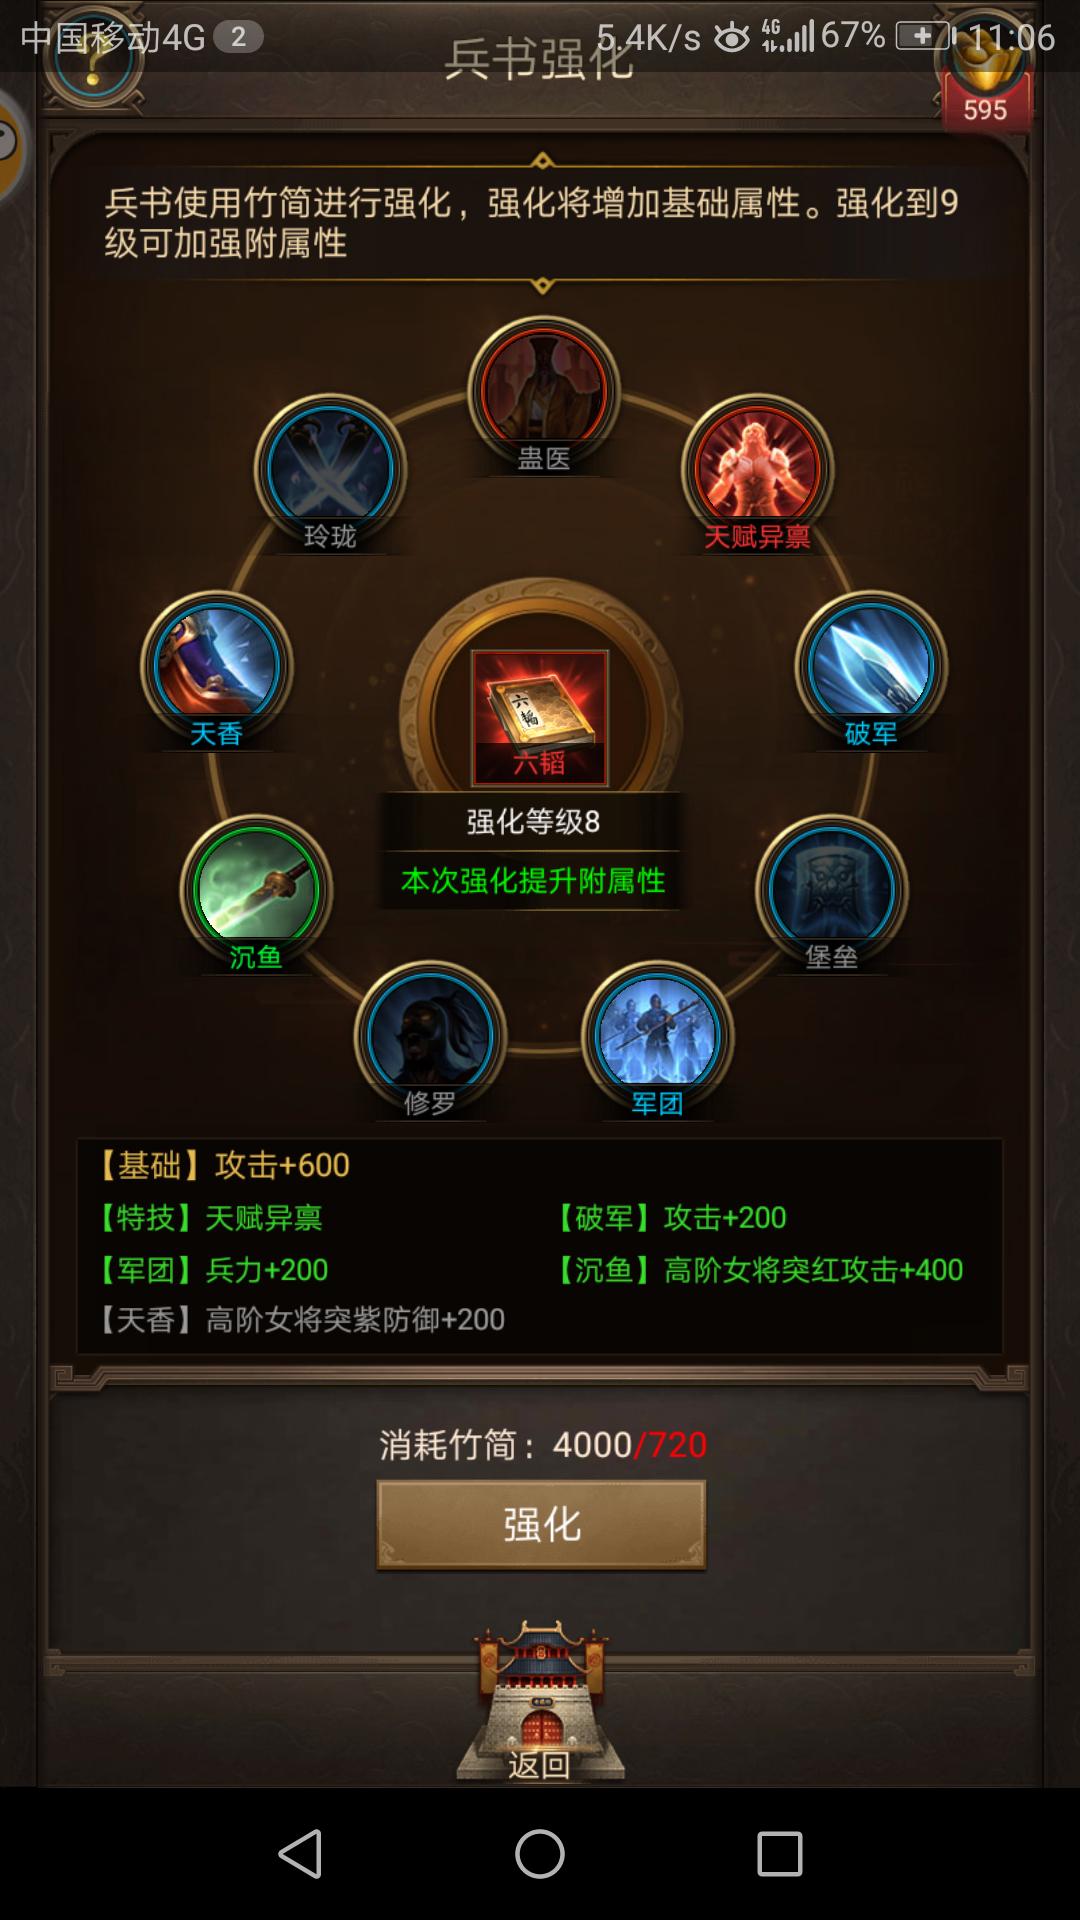 Screenshot_20180911-110658.png